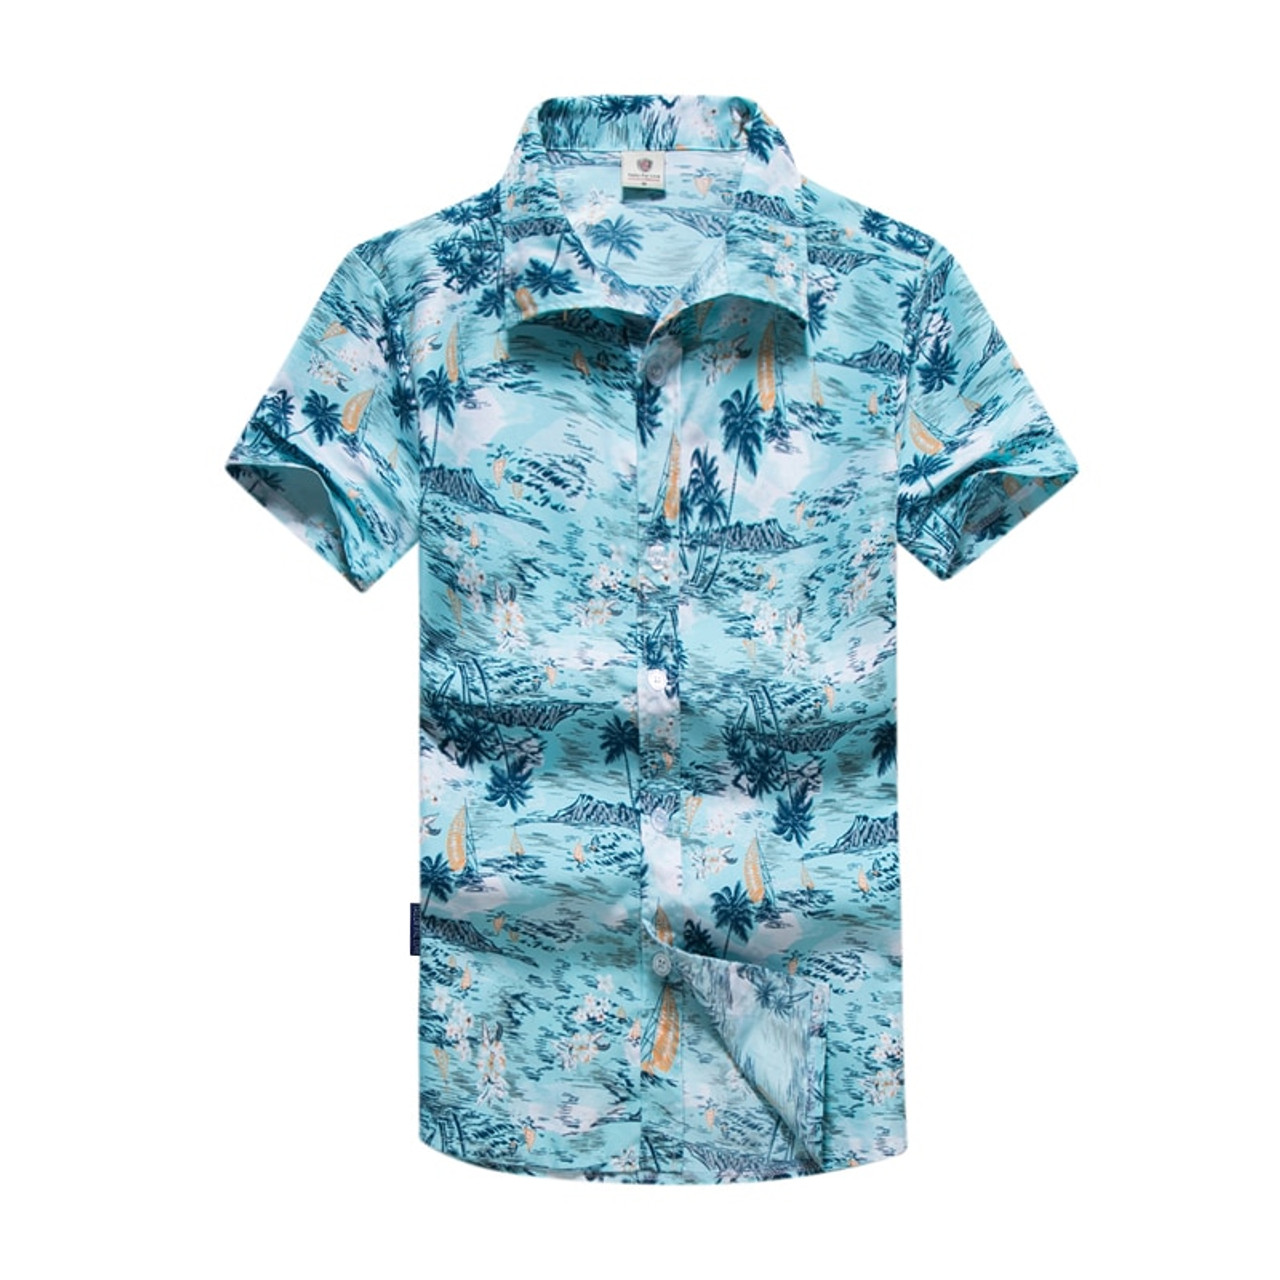 Mens Hawaiian Shirts Short Sleeve Tropical Palm Shirts Men Summer Camisa Masculina Fancy Beach Shirts Men Plus Size 5XL